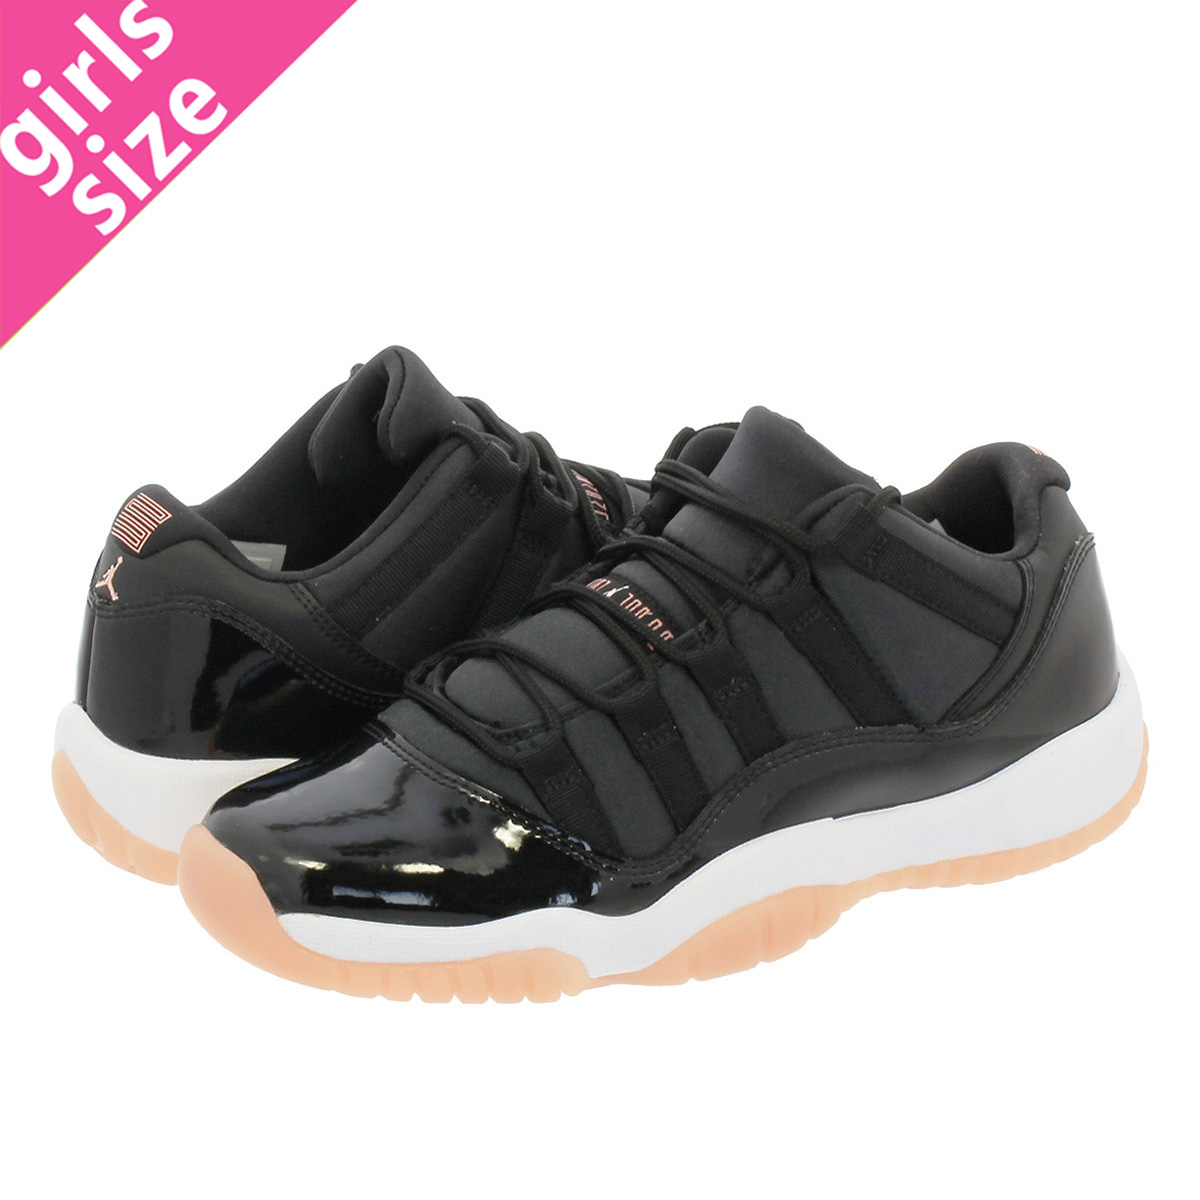 ead891128ef5ce NIKE AIR JORDAN 11 RETRO LOW GG Nike Air Jordan 11 nostalgic low BG BLACK BLEACHED  CORAL WHITE 580